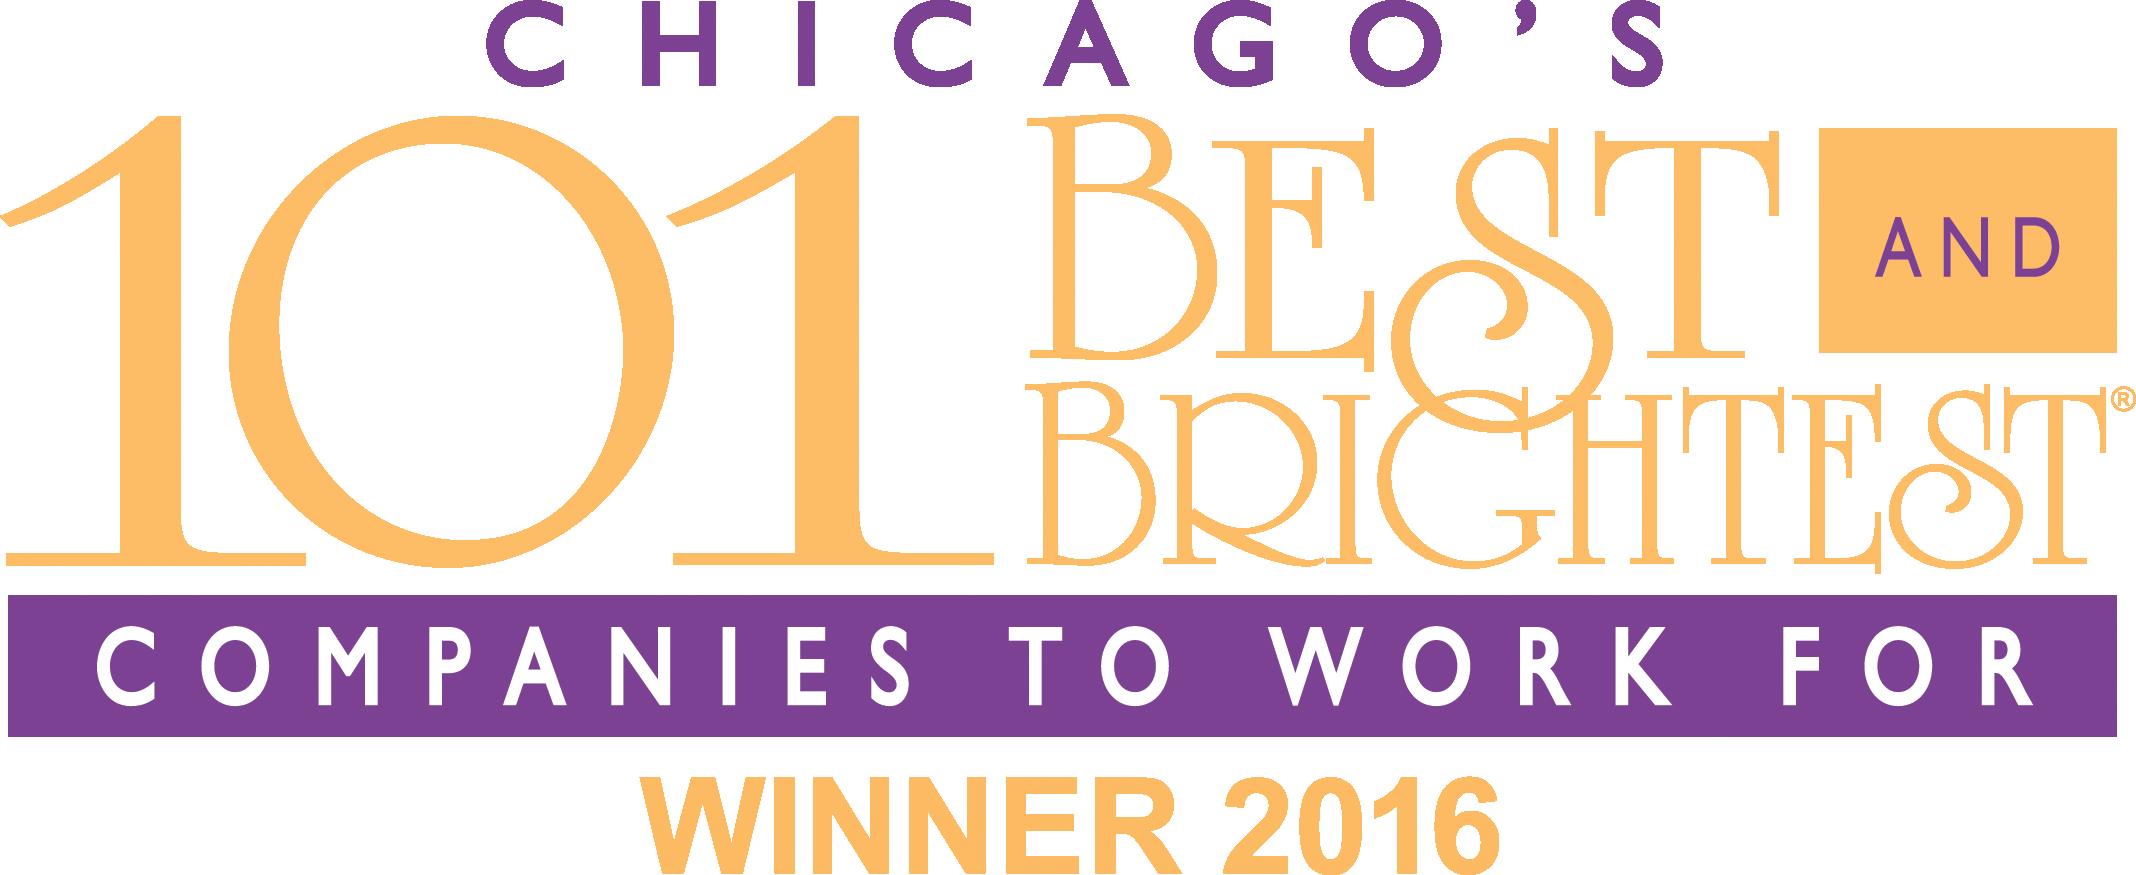 Chicago101BBWin16_RGB_horz.png